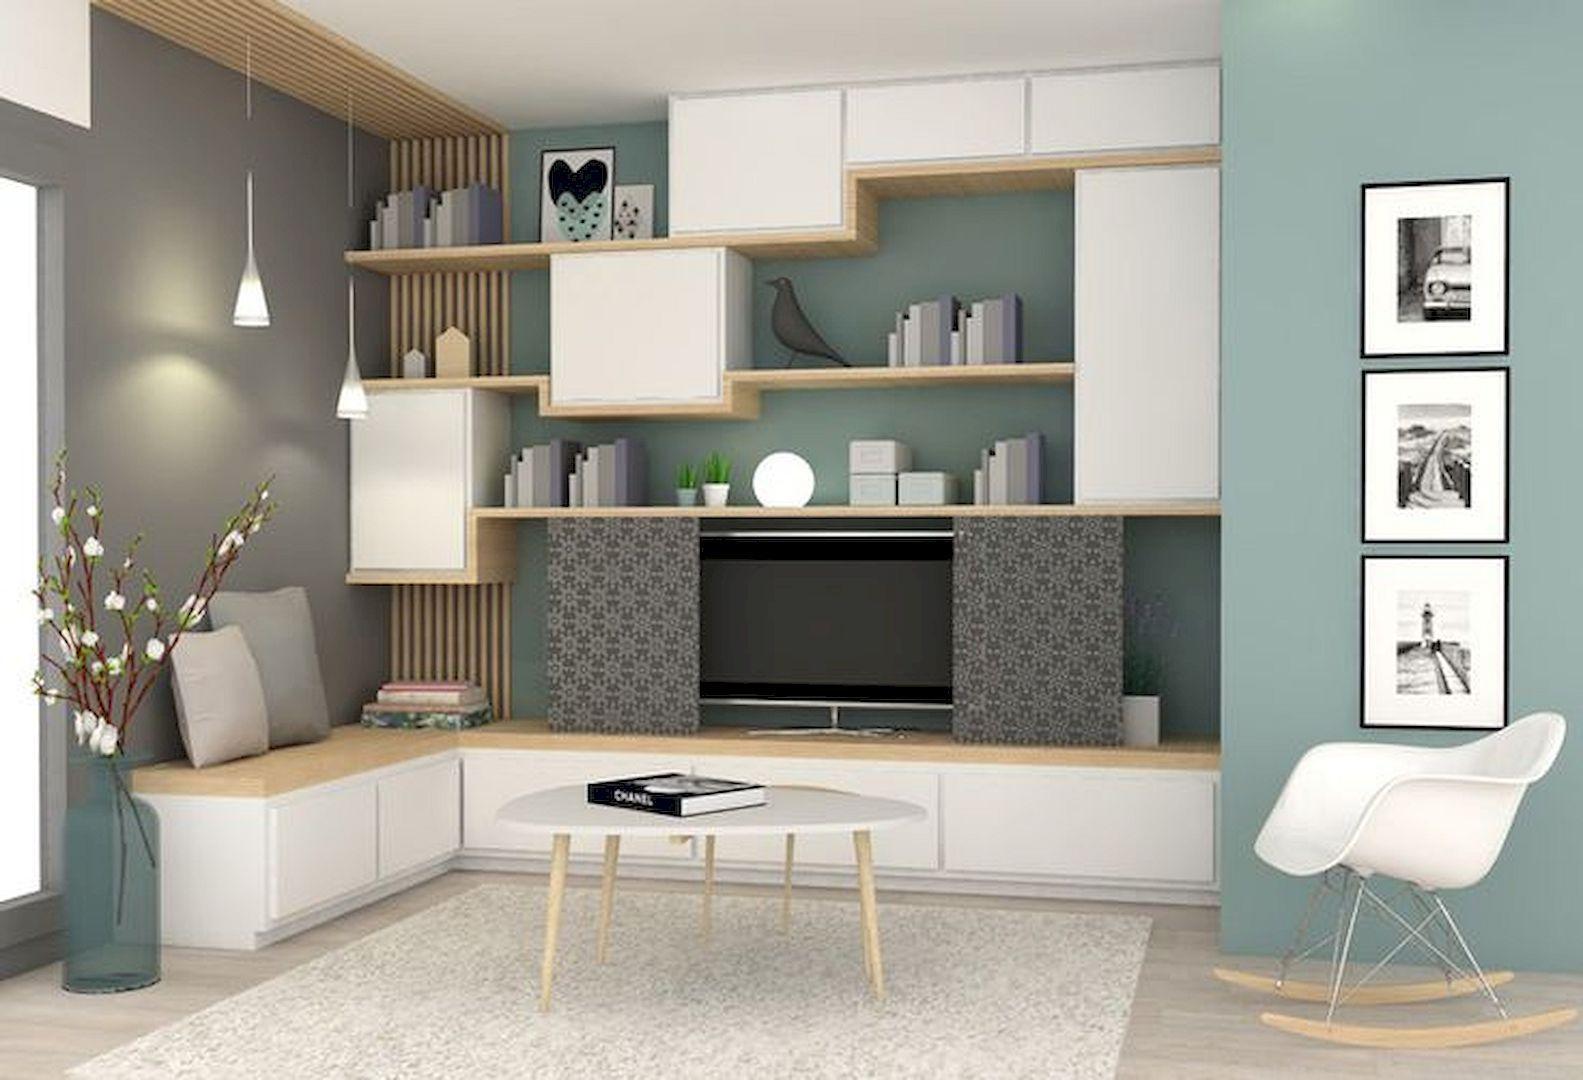 Best Interior Design Inspirations 2017 155 Photos Interiors  # Meuble Tv Rocco